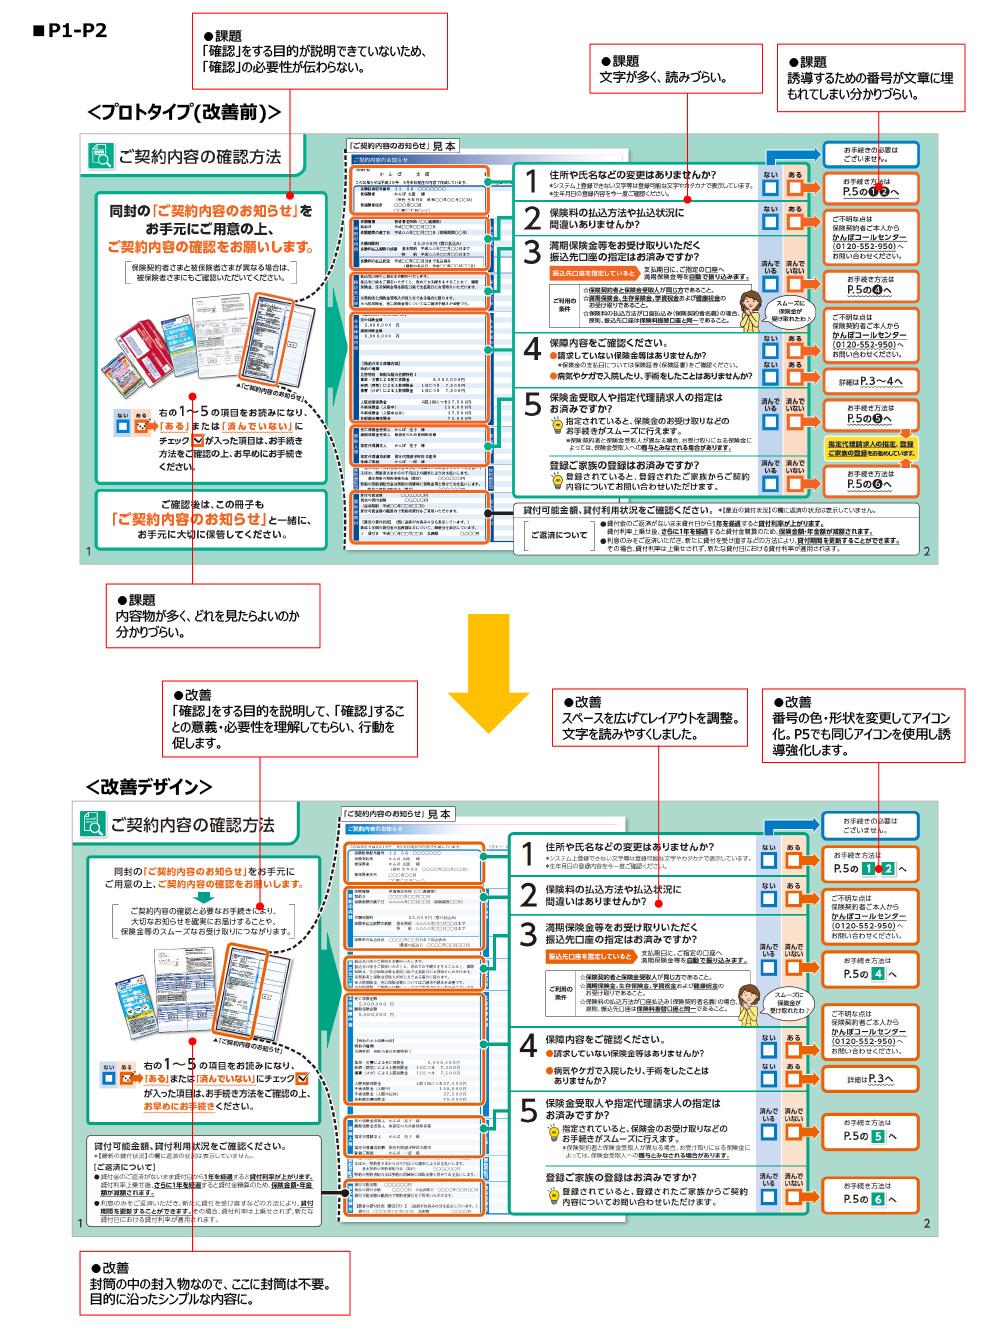 P1-P2 プロトタイプ(改善前)→改善デザイン